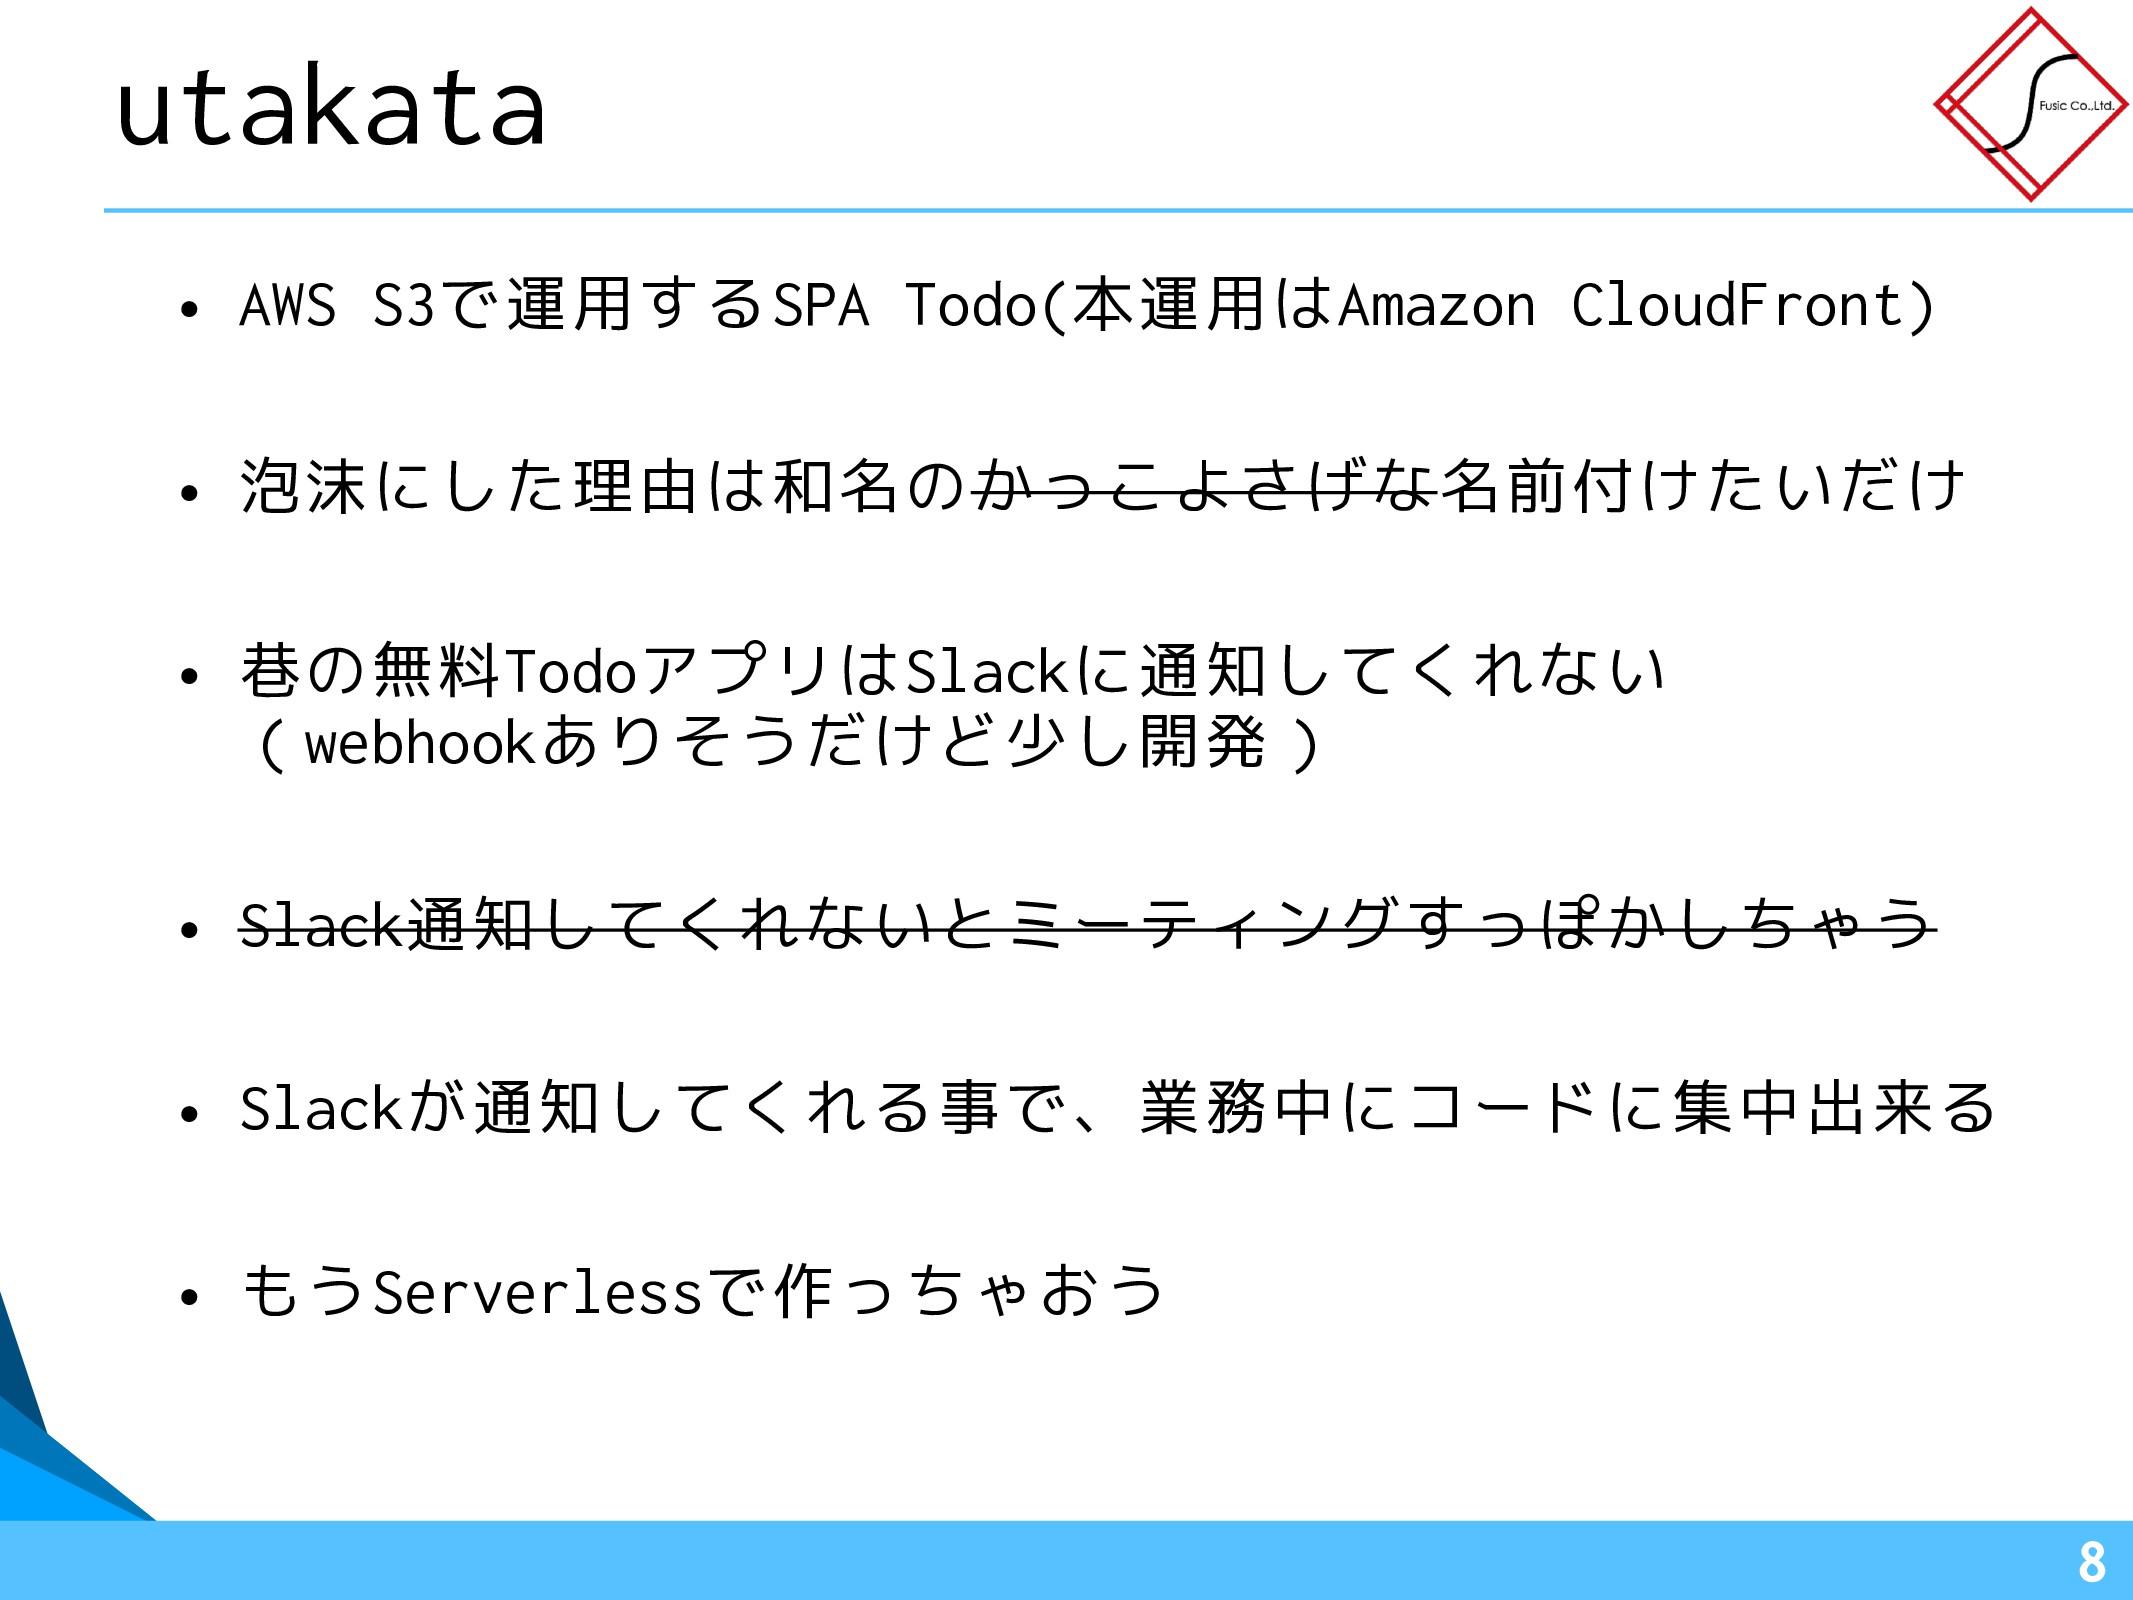 • AWS S3で運用するSPA Todo(本運用はAmazon CloudFront) • ...